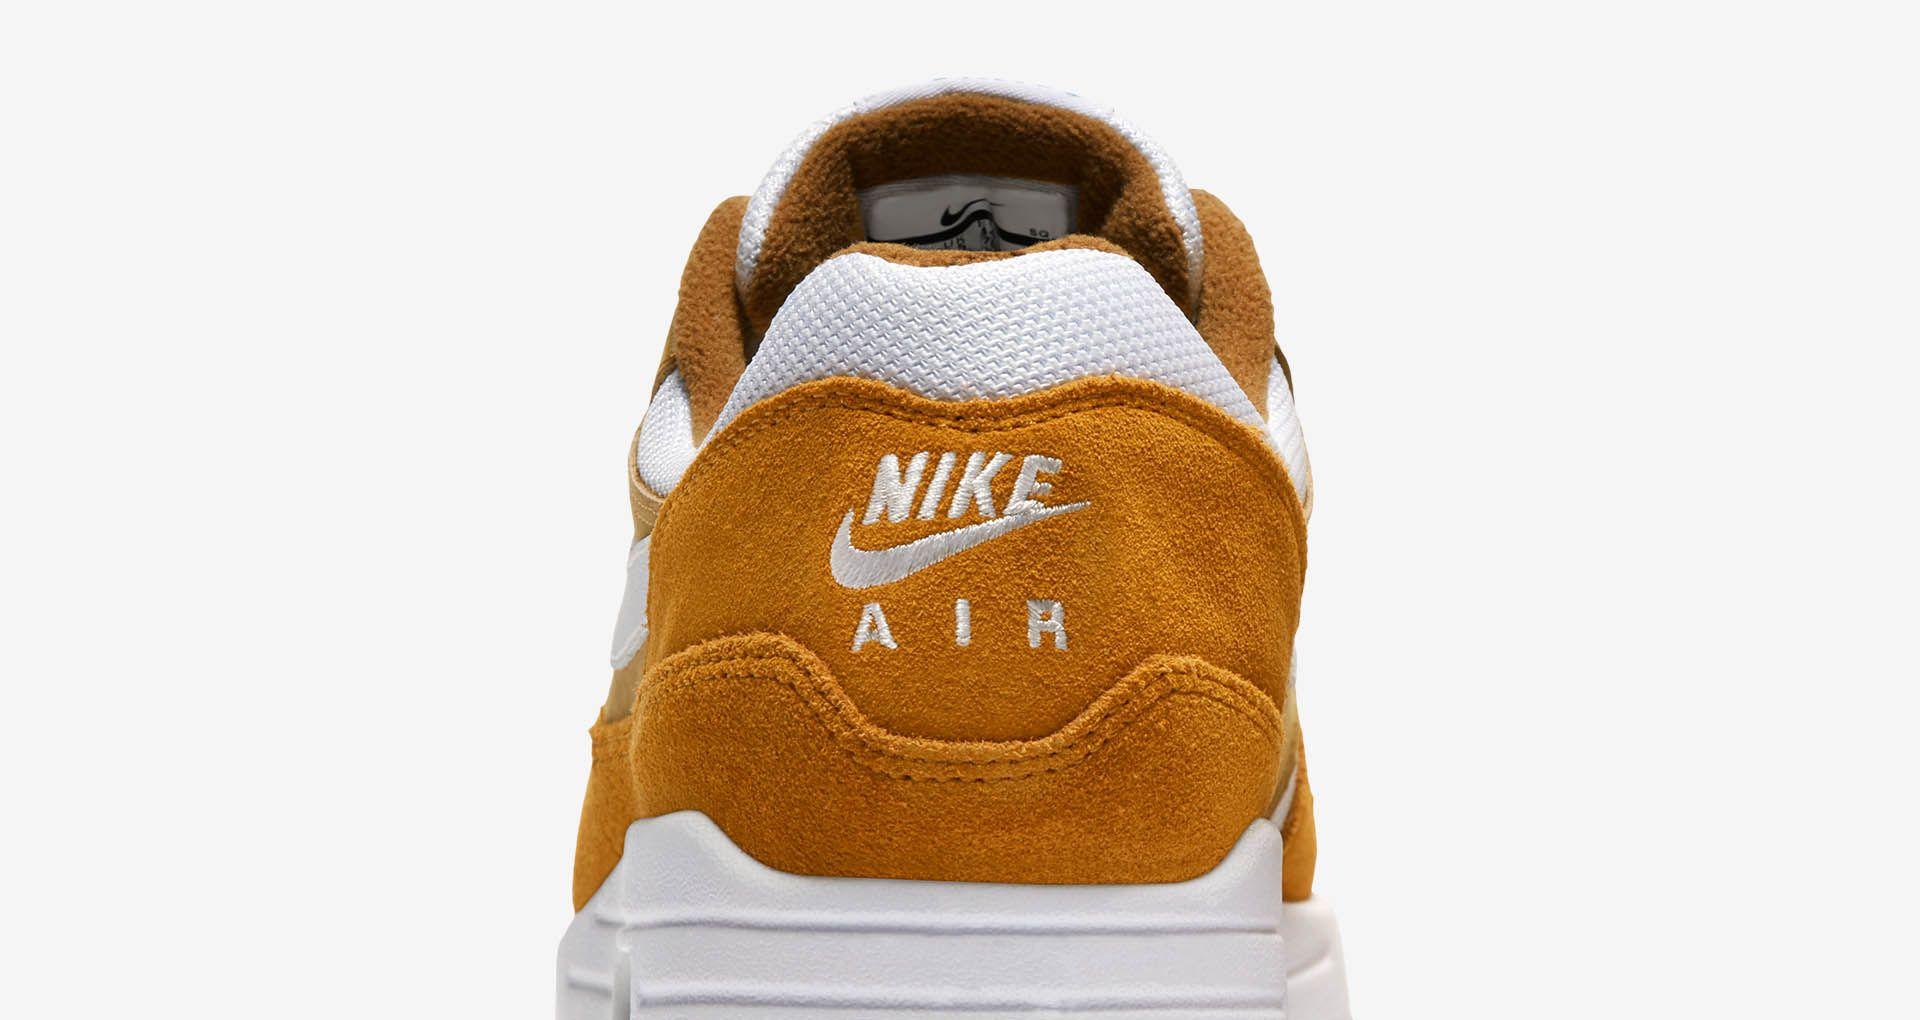 Nike Air Max 1 Premium 'Dark Curry' Release Date. Nike SNKRS